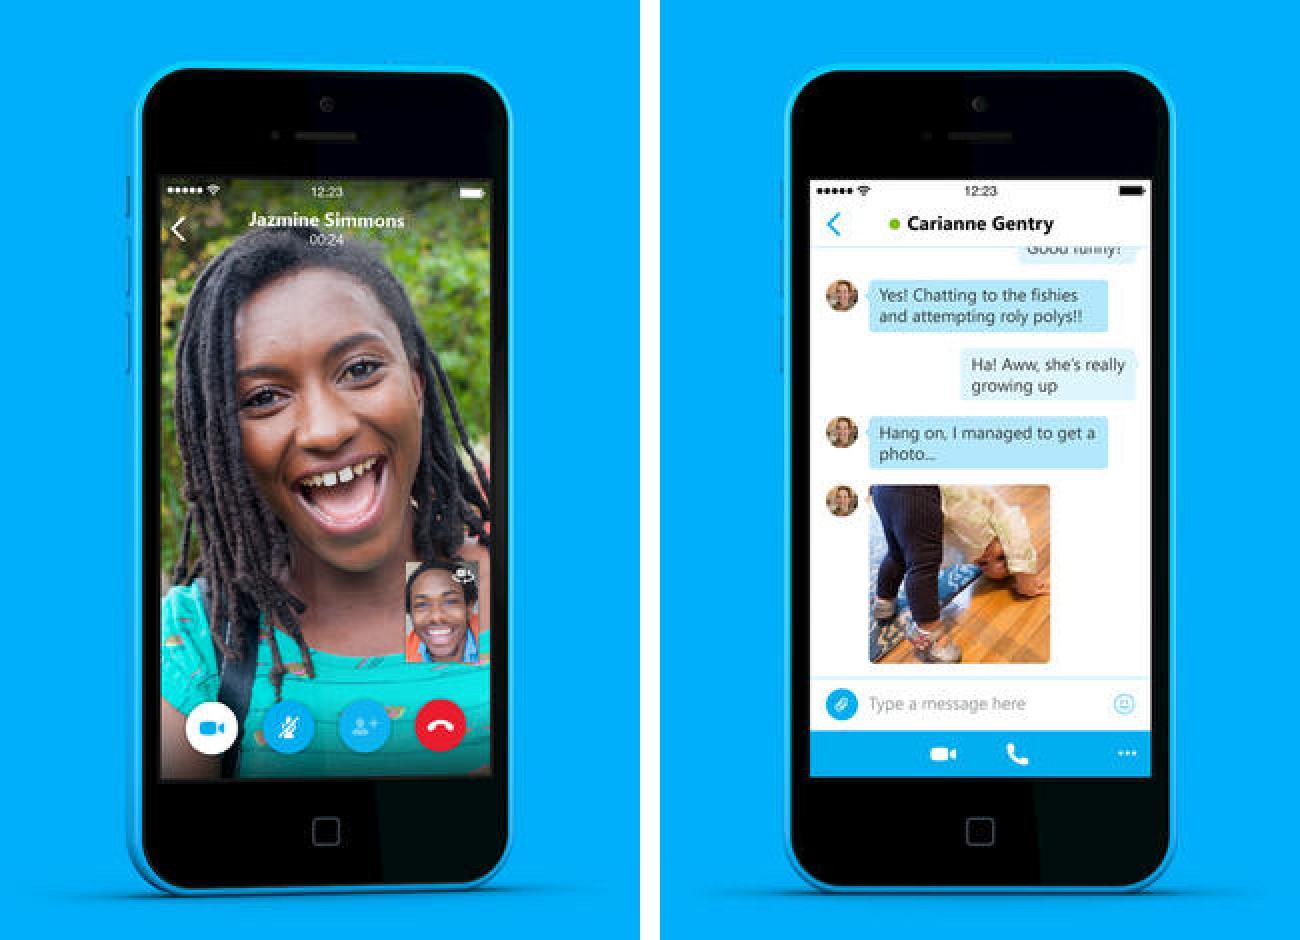 Download Skype App for iOS 8, iOS 9, iOS 10